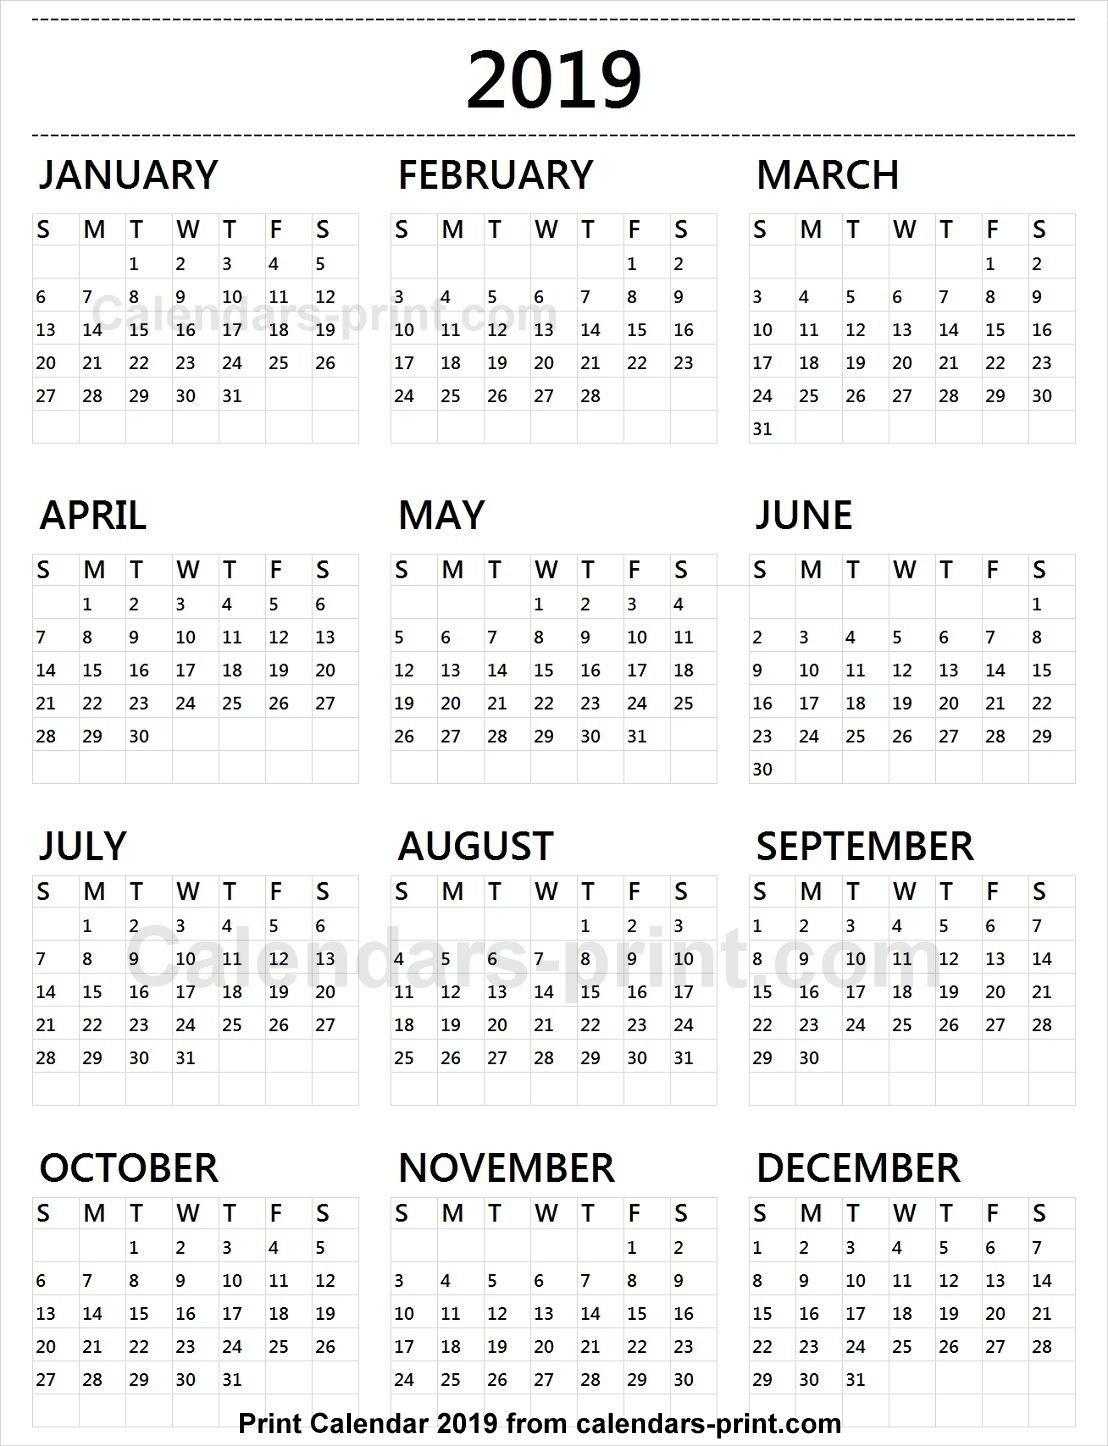 Calendar 2019 Tumblr   2019 Yearly Calendar In 2019   Calendar Calendar 2019 To Print